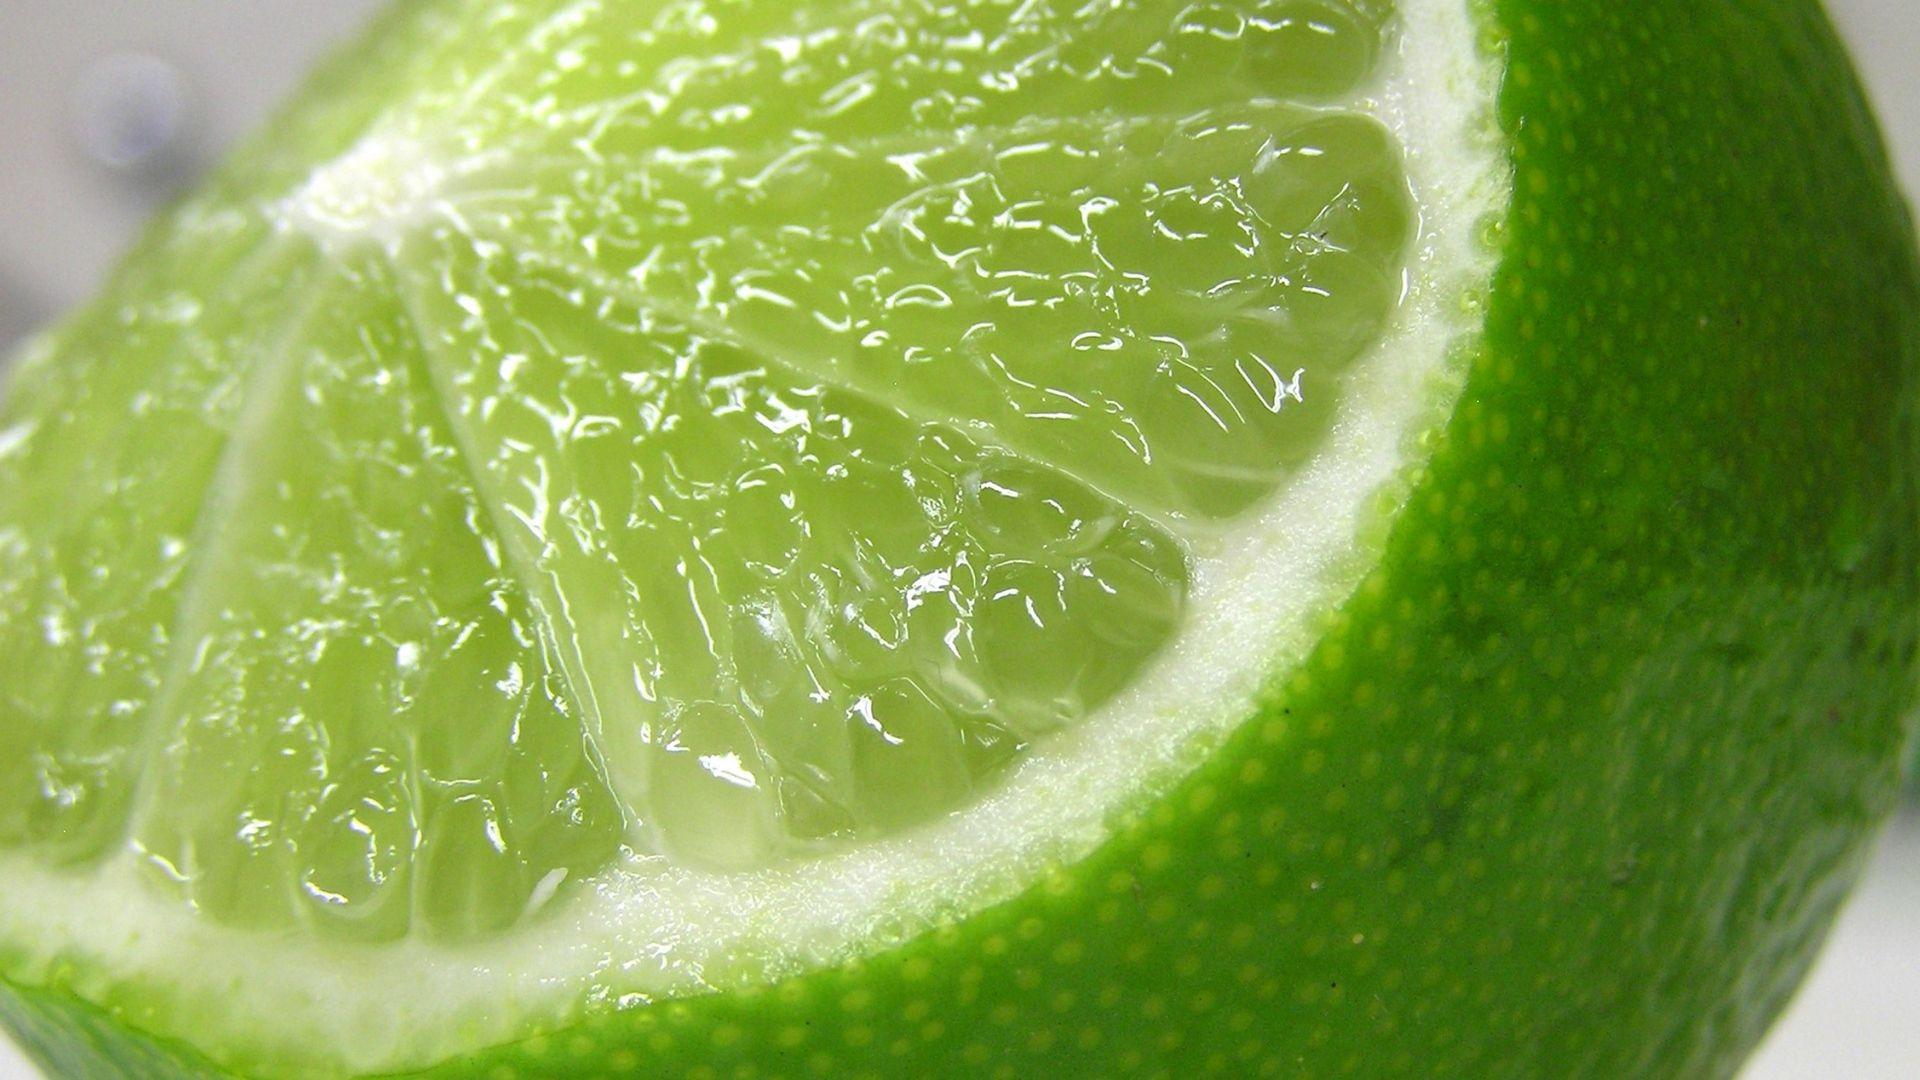 Lime screen wallpaper